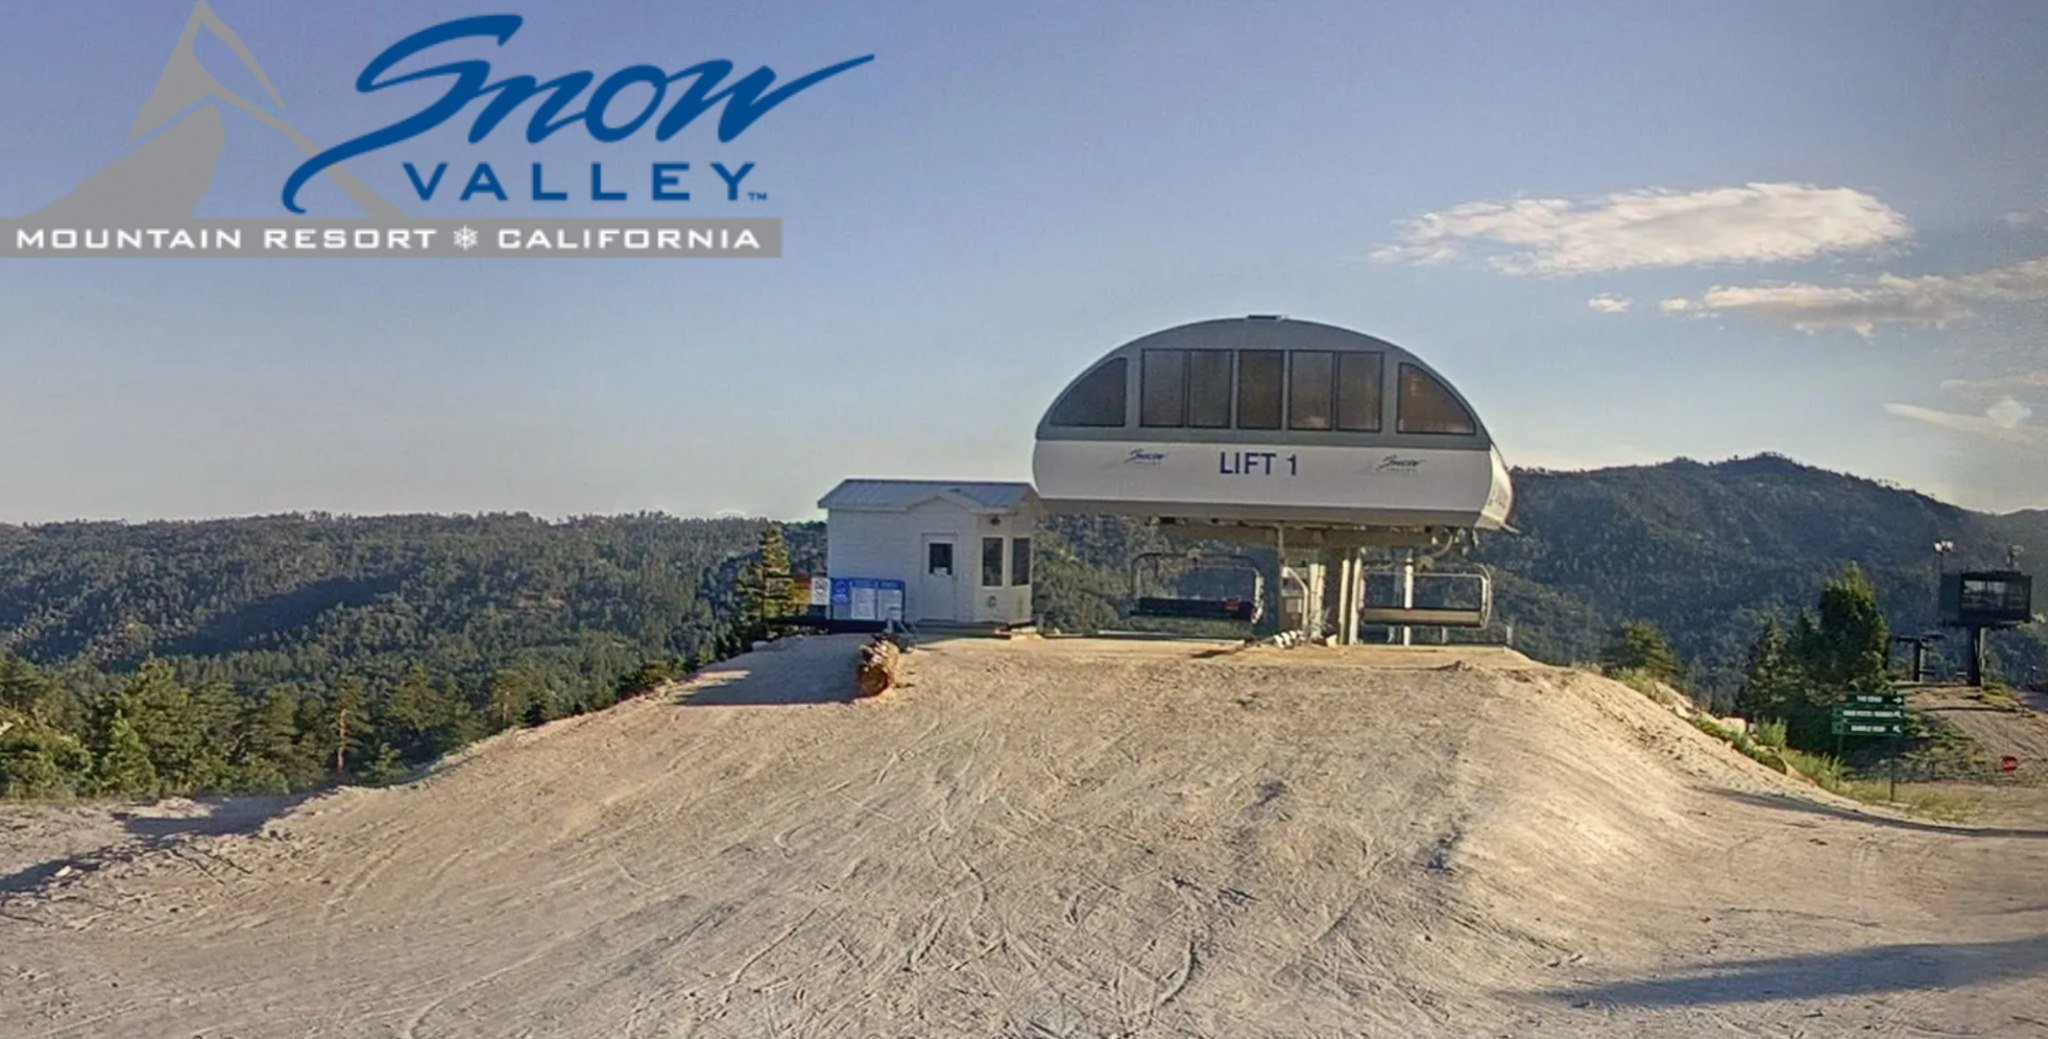 Platinum Sponsor - Snow Valley